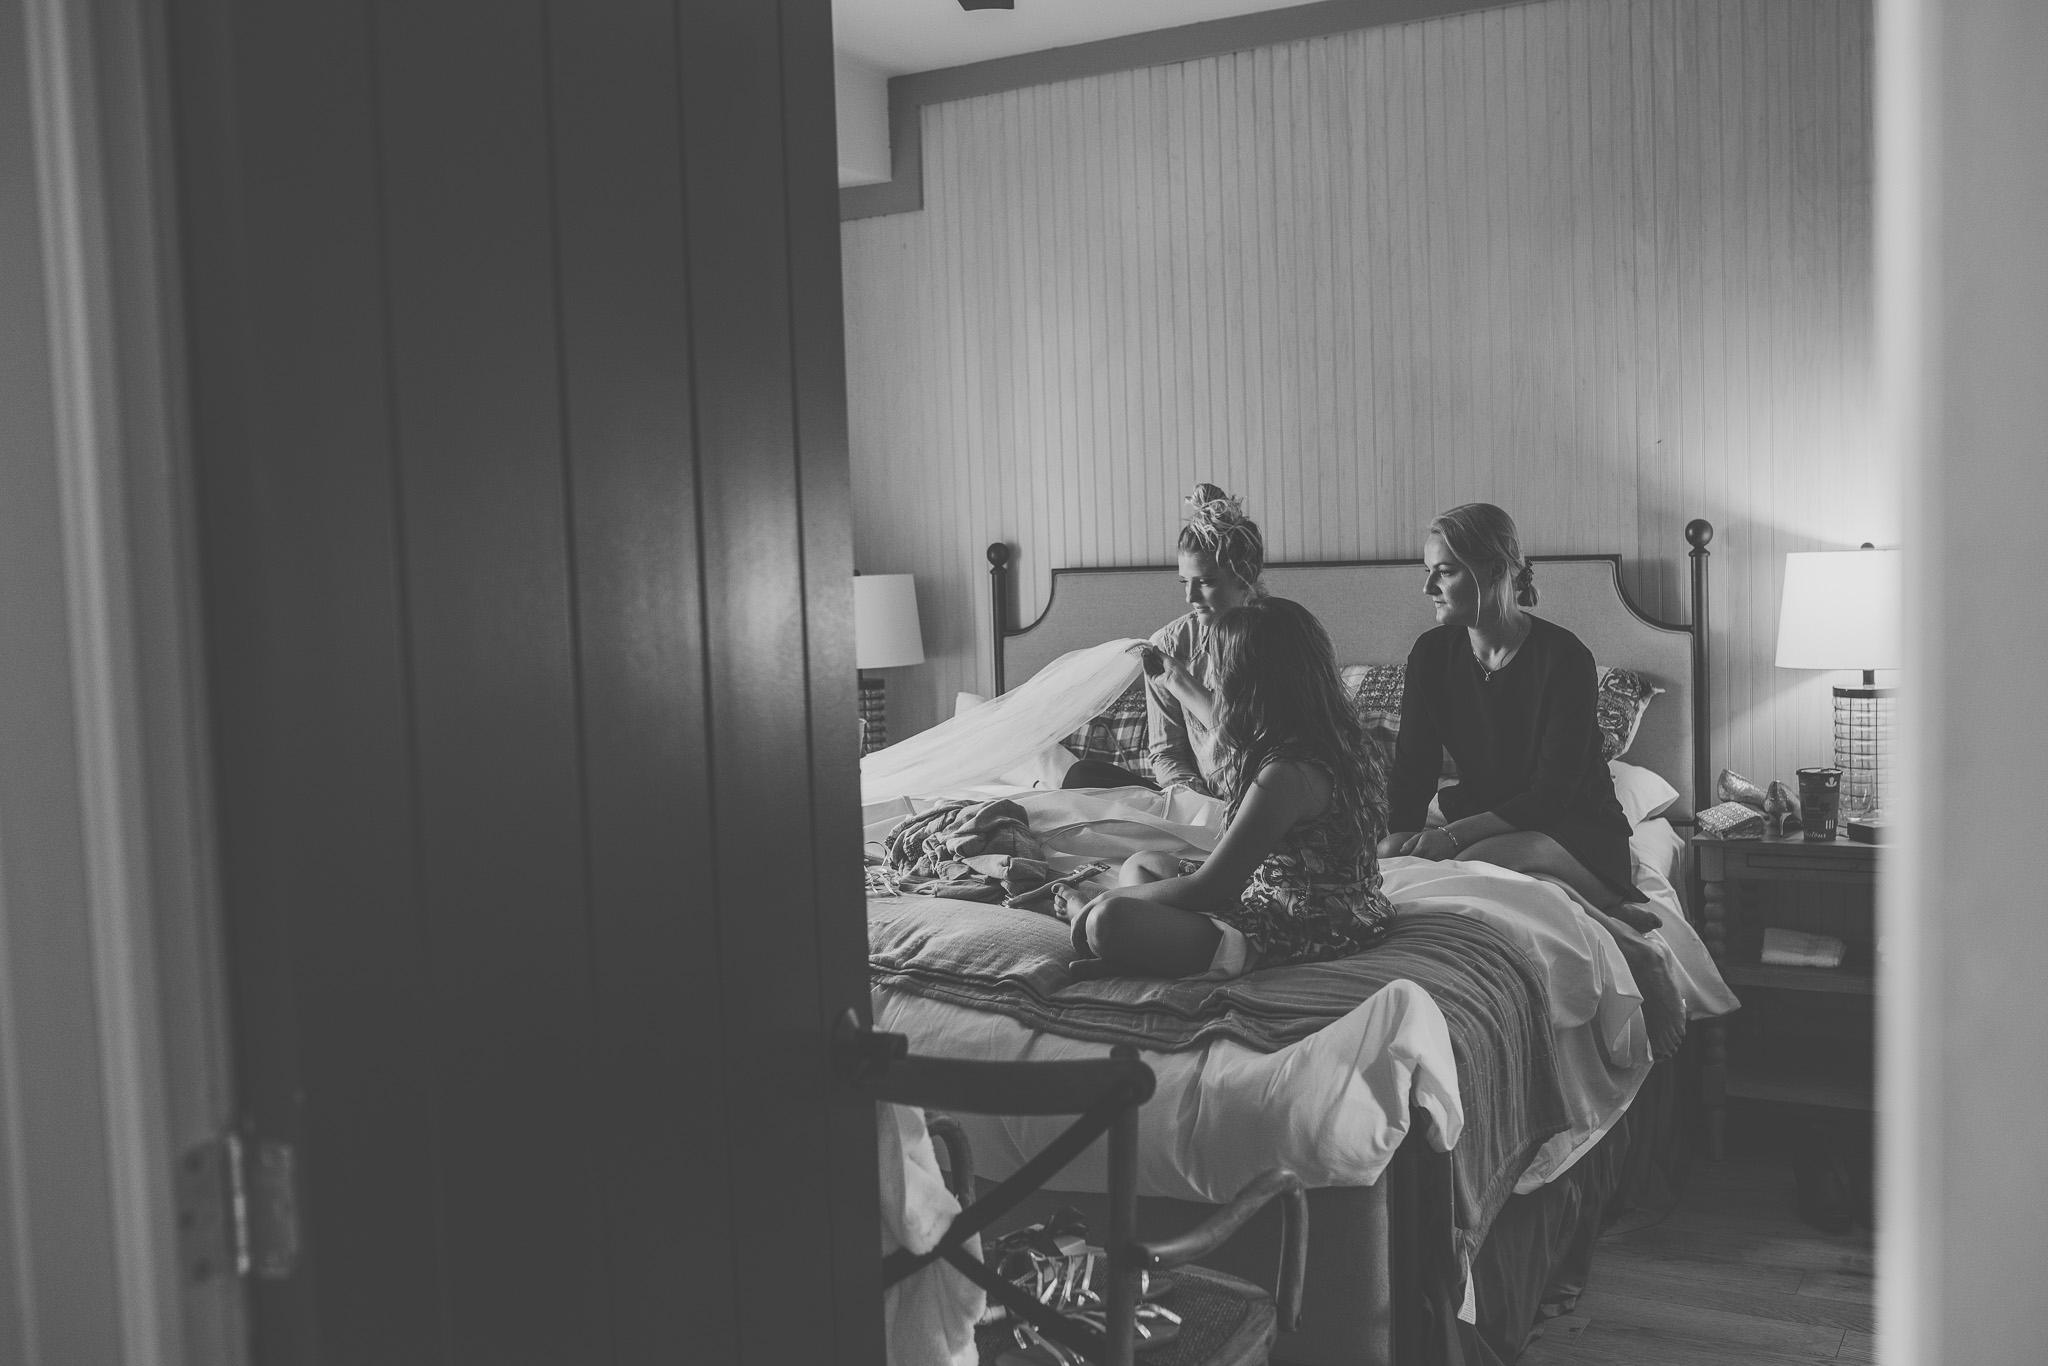 cottage wedding, keene, ontario, cottage, quiet wedding, wedding on the lake, toronto photographer, toronto photography, northumberland county, port hope photographer, port hope wedding photographer, toronto wedding photographer, bride, groom, summer wedding, peterborough wedding, peterborough wedding photography, peterborough wedding photographer, keene wedding, keene wedding photographer, documentary wedding photography, documentary wedding photographer, candid wedding photography, cottage, trees, nature, veil, intimate wedding, bridesmaids, getting ready, window light, black and white